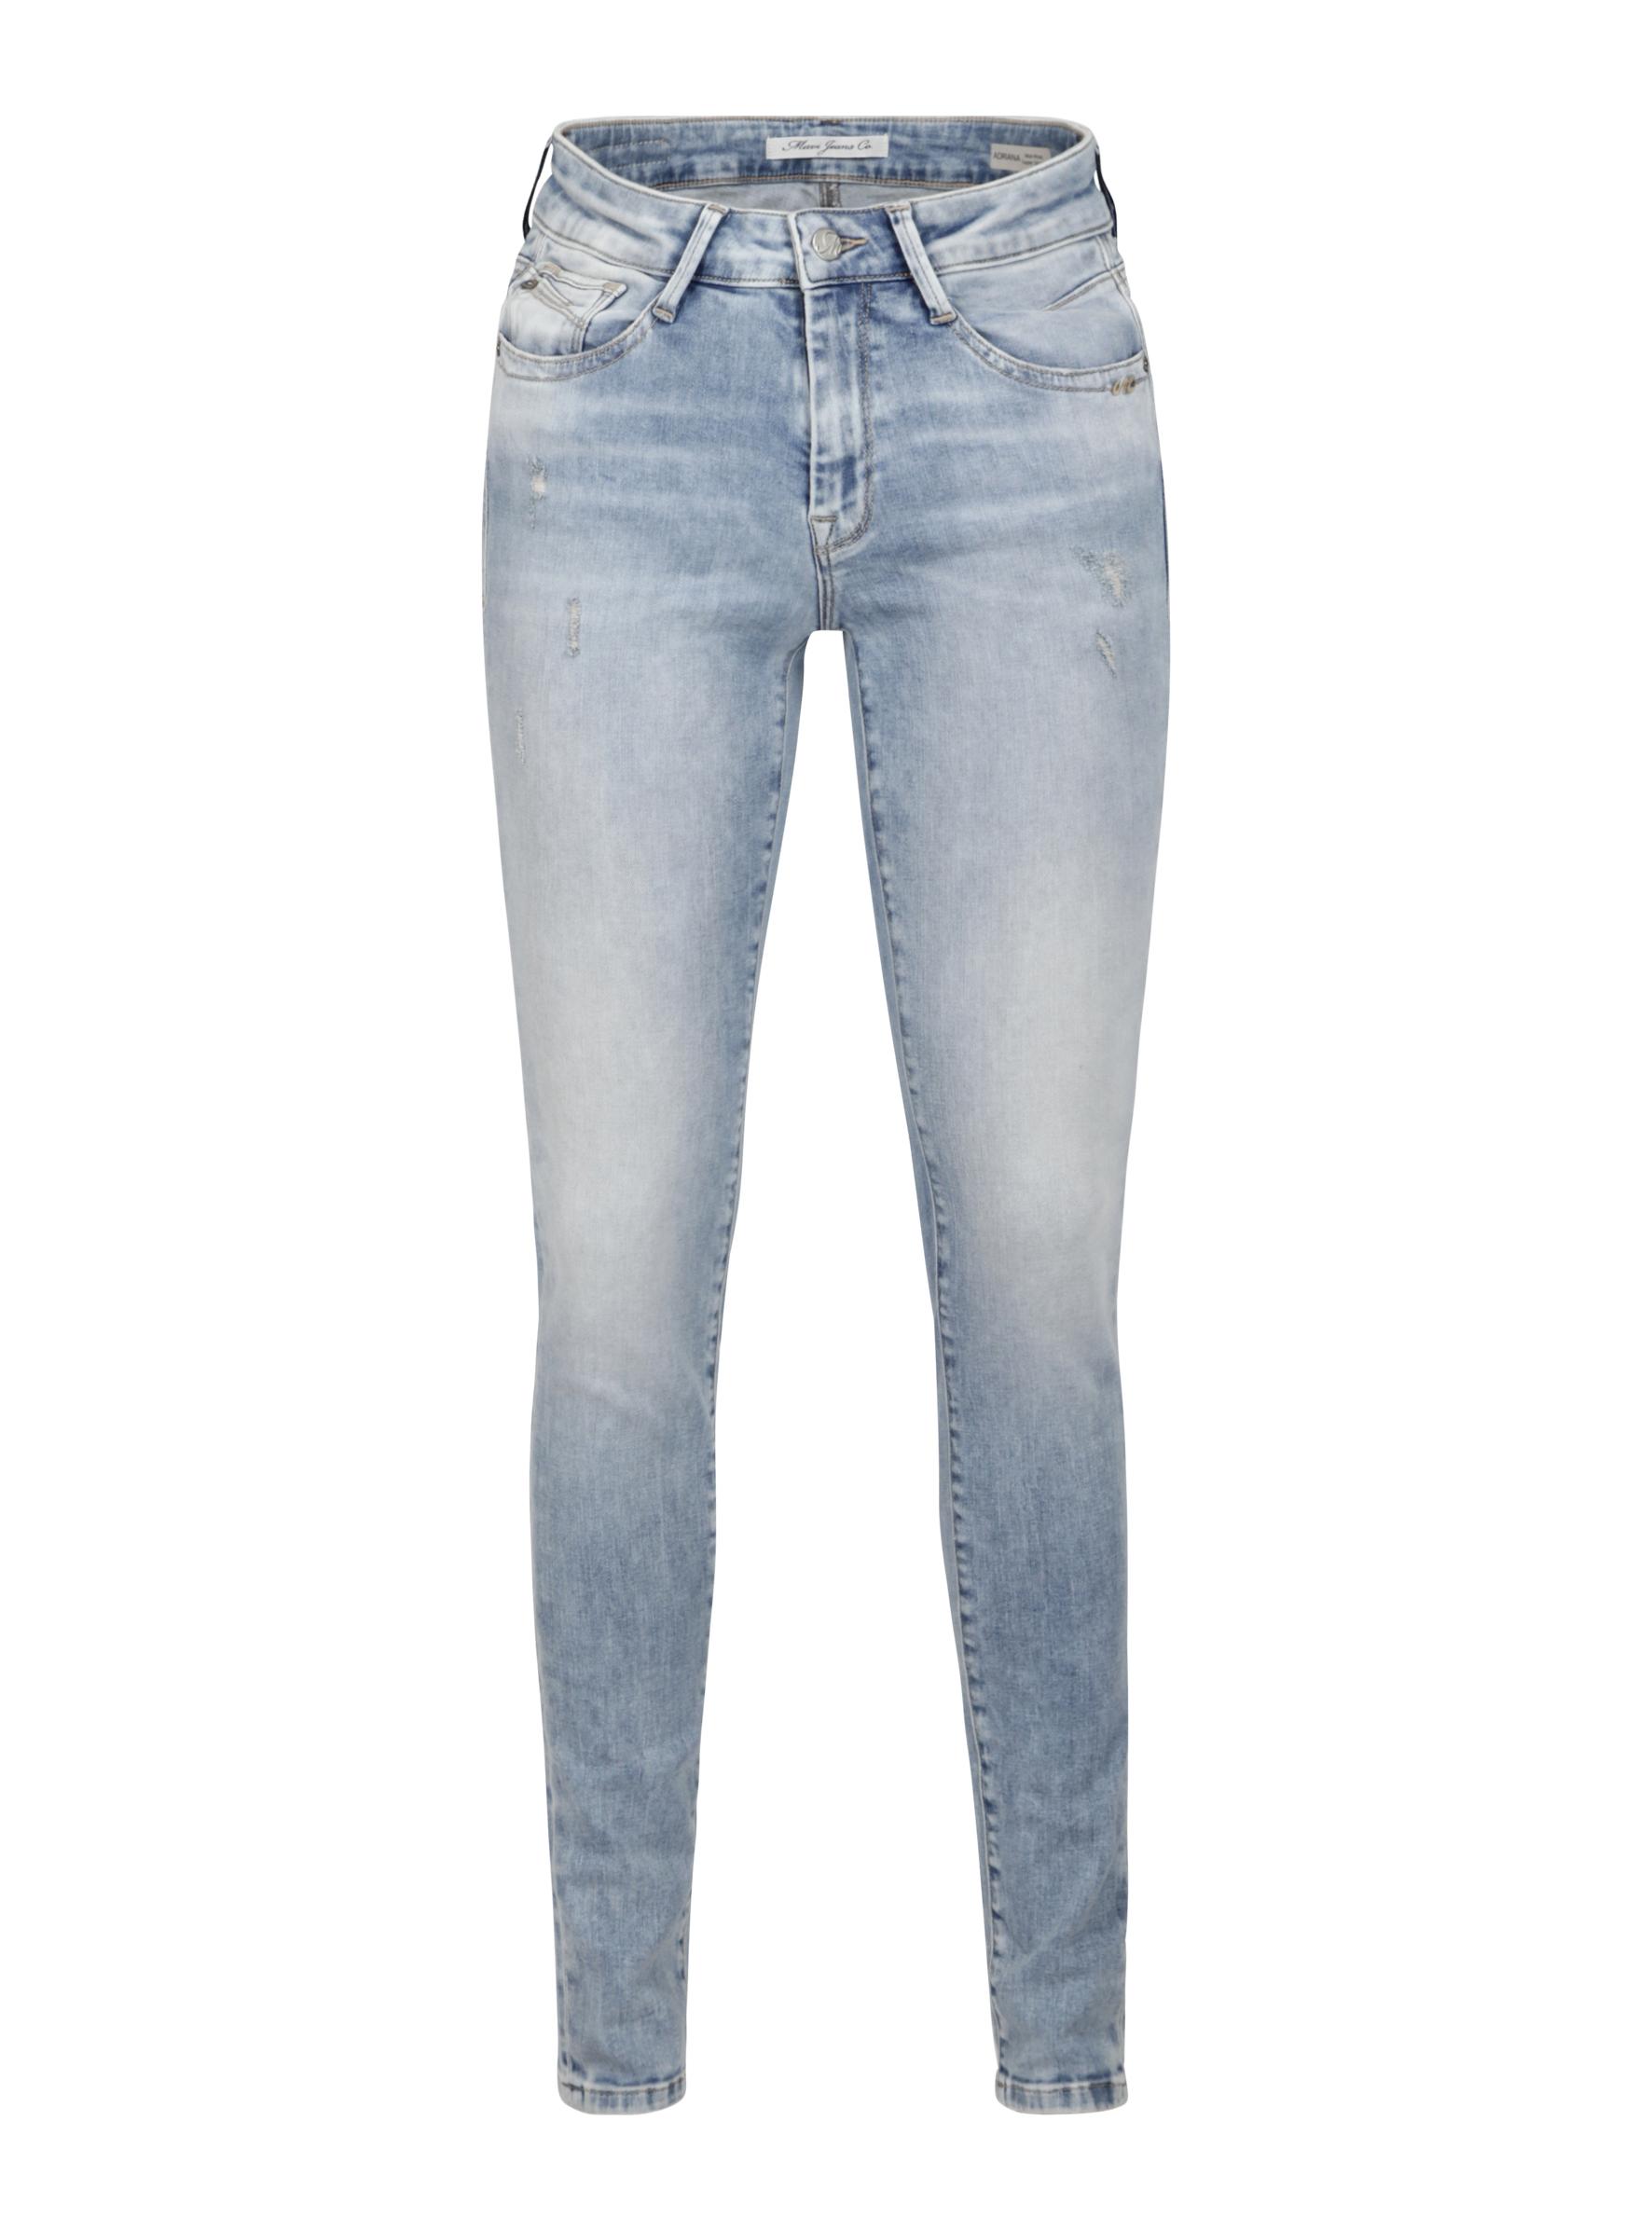 Mavi Jeans Fit Adriana in neuer hellen Waschung in der Mavi Jeans Sommer Kollektion